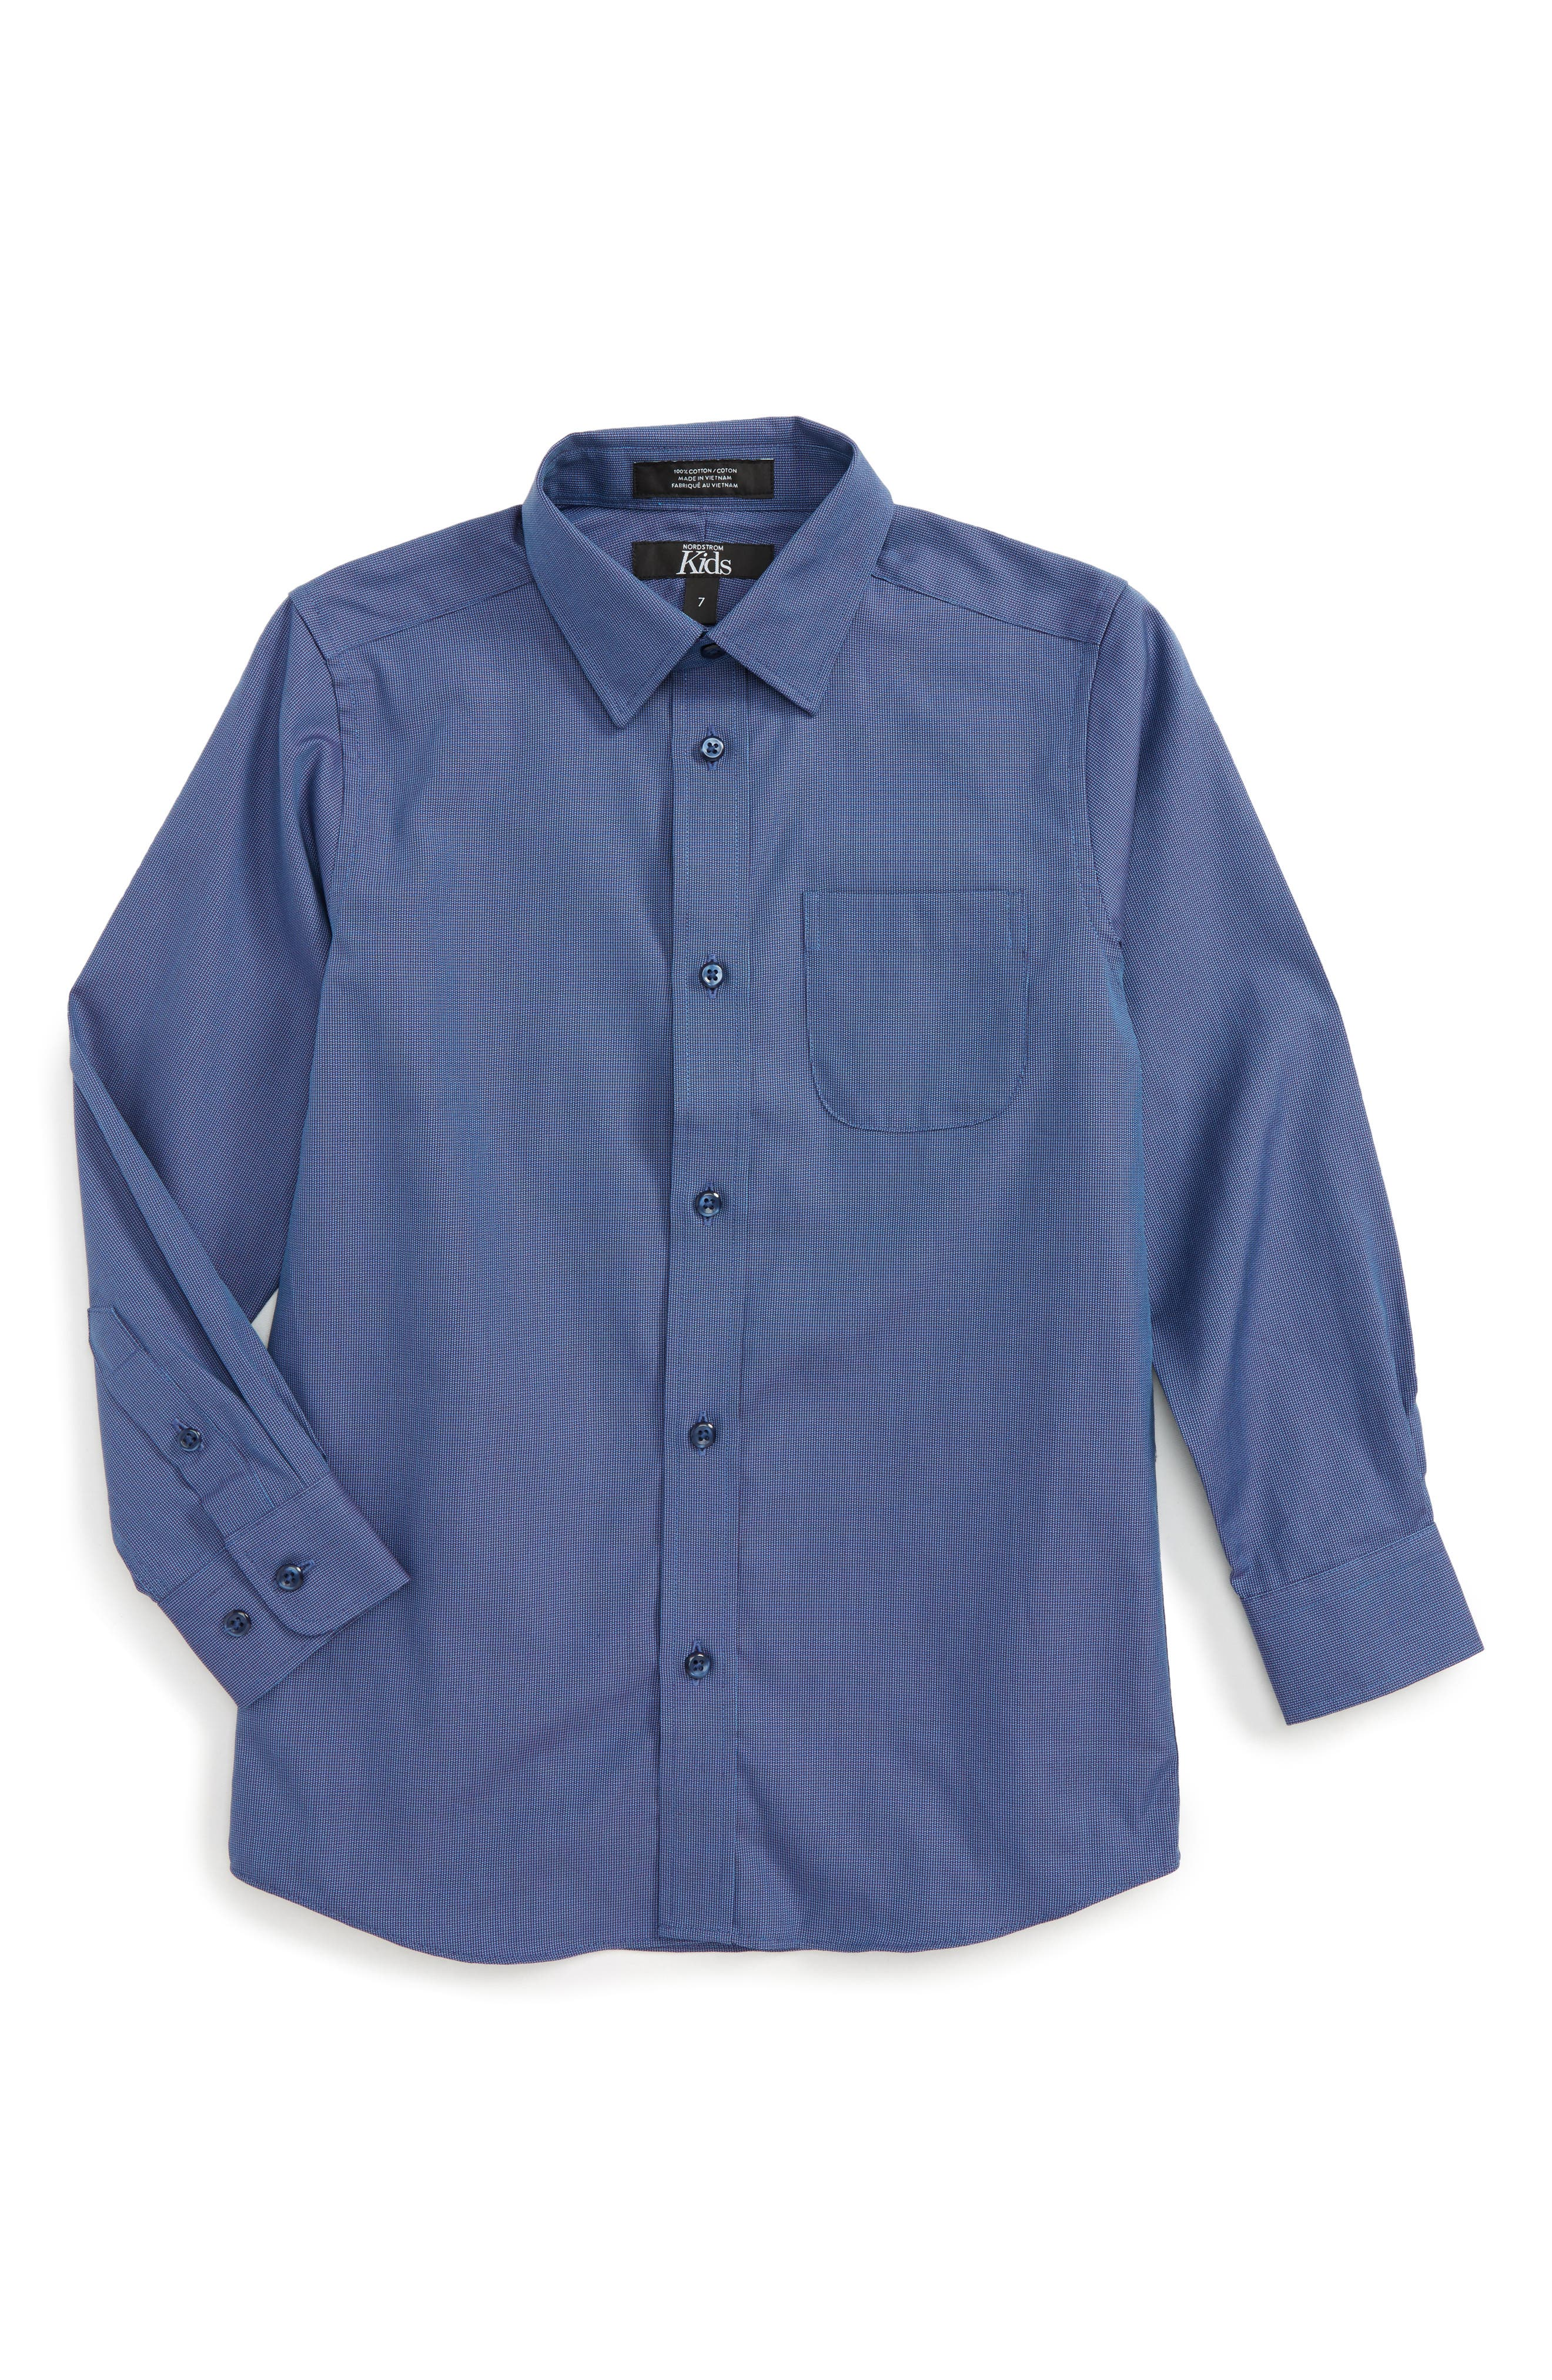 Patriot Cotton Poplin Dress Shirt,                             Main thumbnail 1, color,                             Navy Patriot